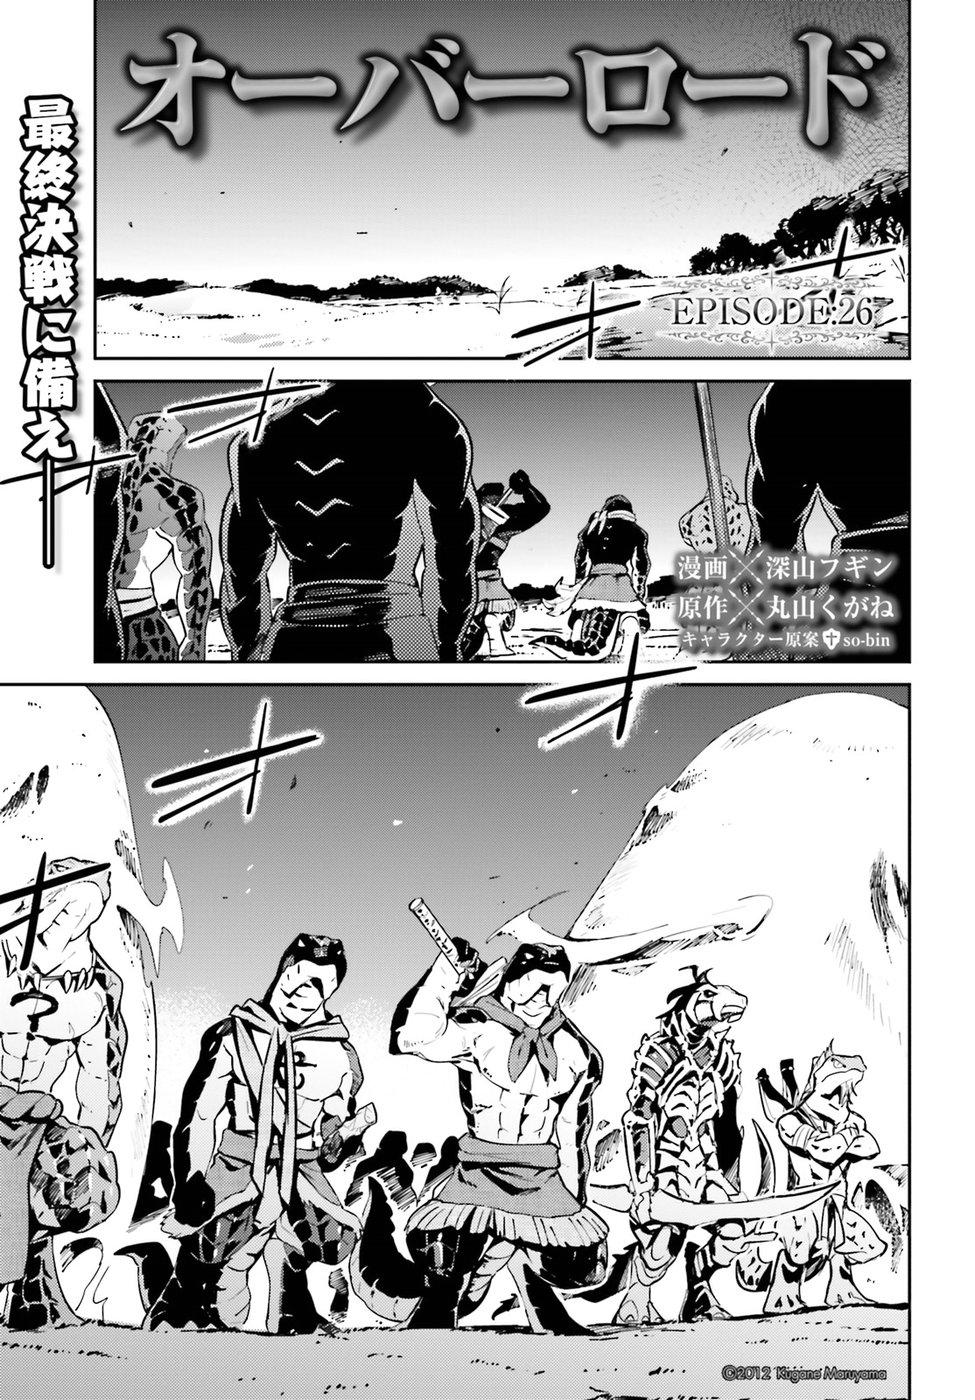 Overlord Manga Chapter 26